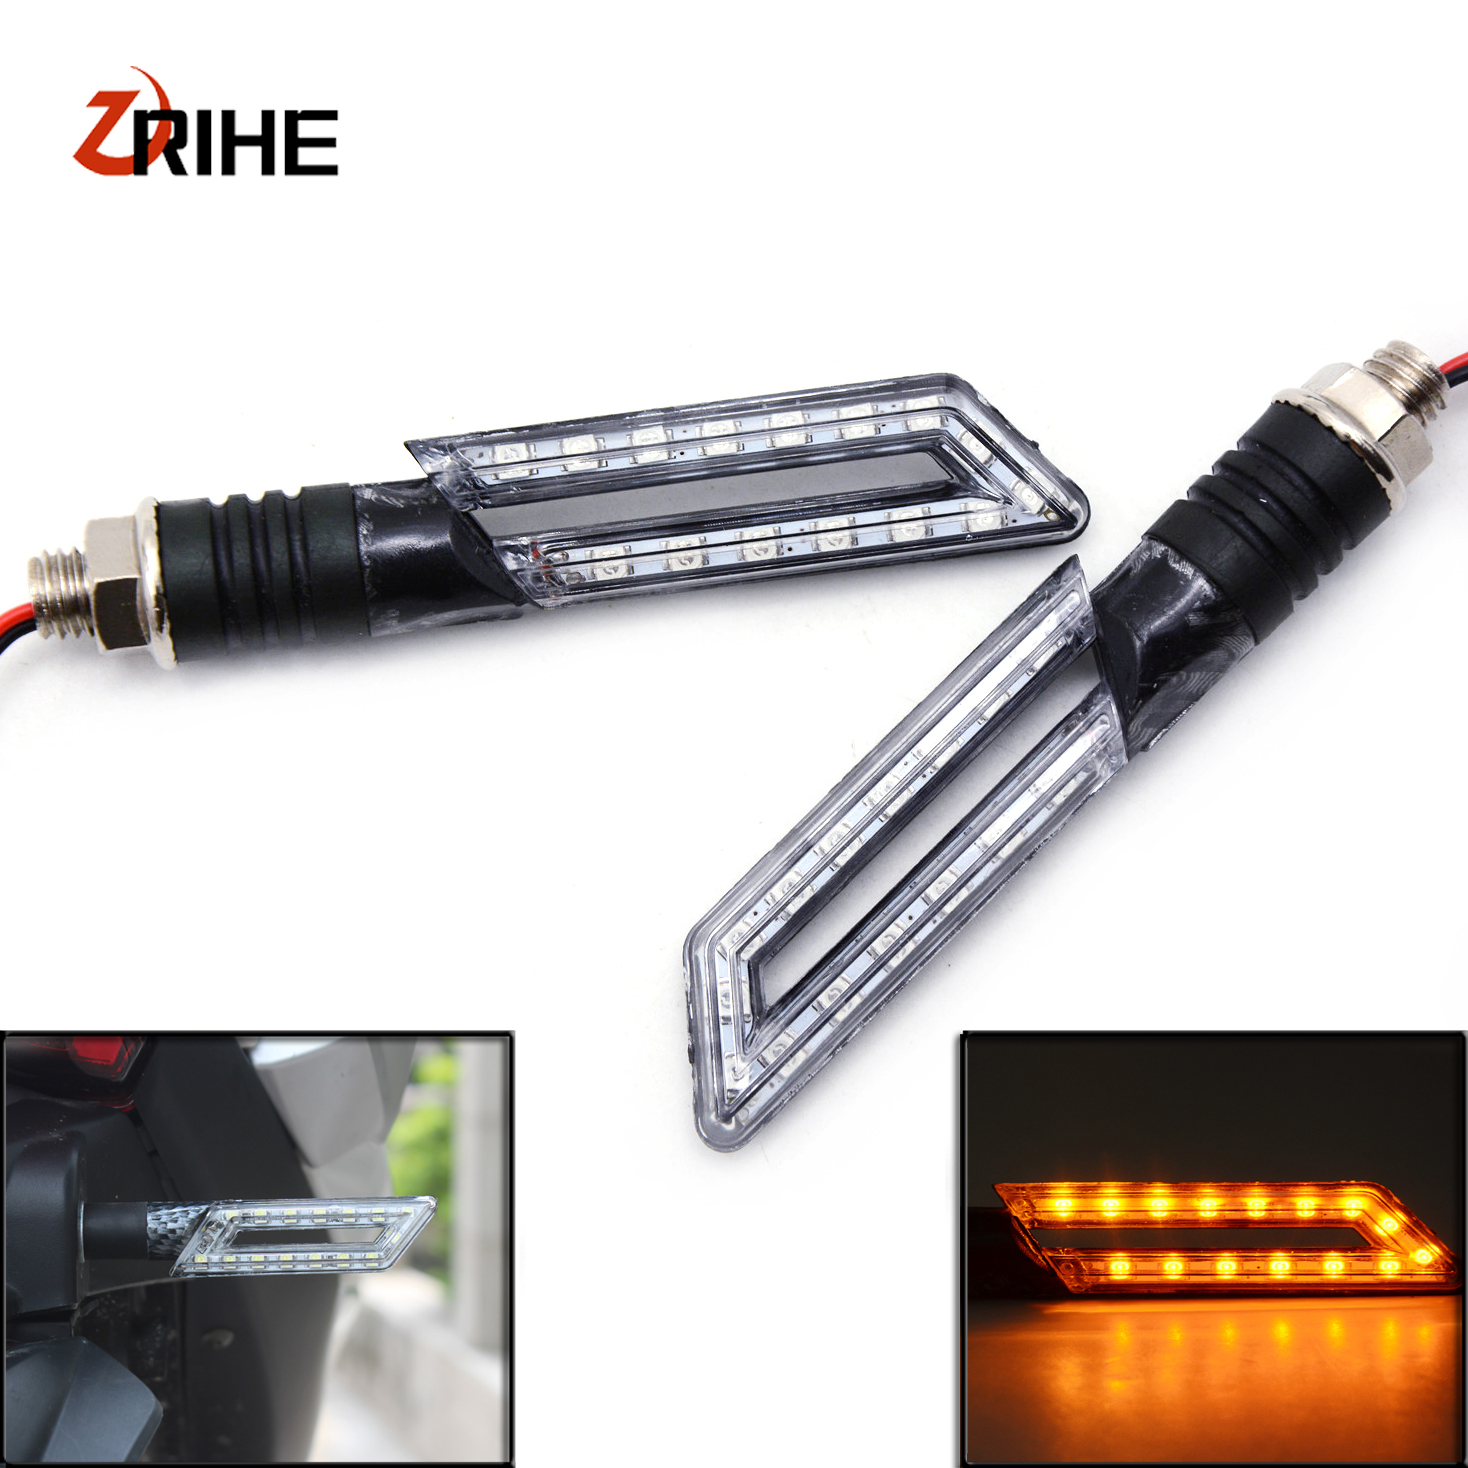 Turn Signal For Yamaha YZF R1 R3 R6 R15 R25 R125 R1M 12V Motorcycle LED high performance Amber high Light Indicator